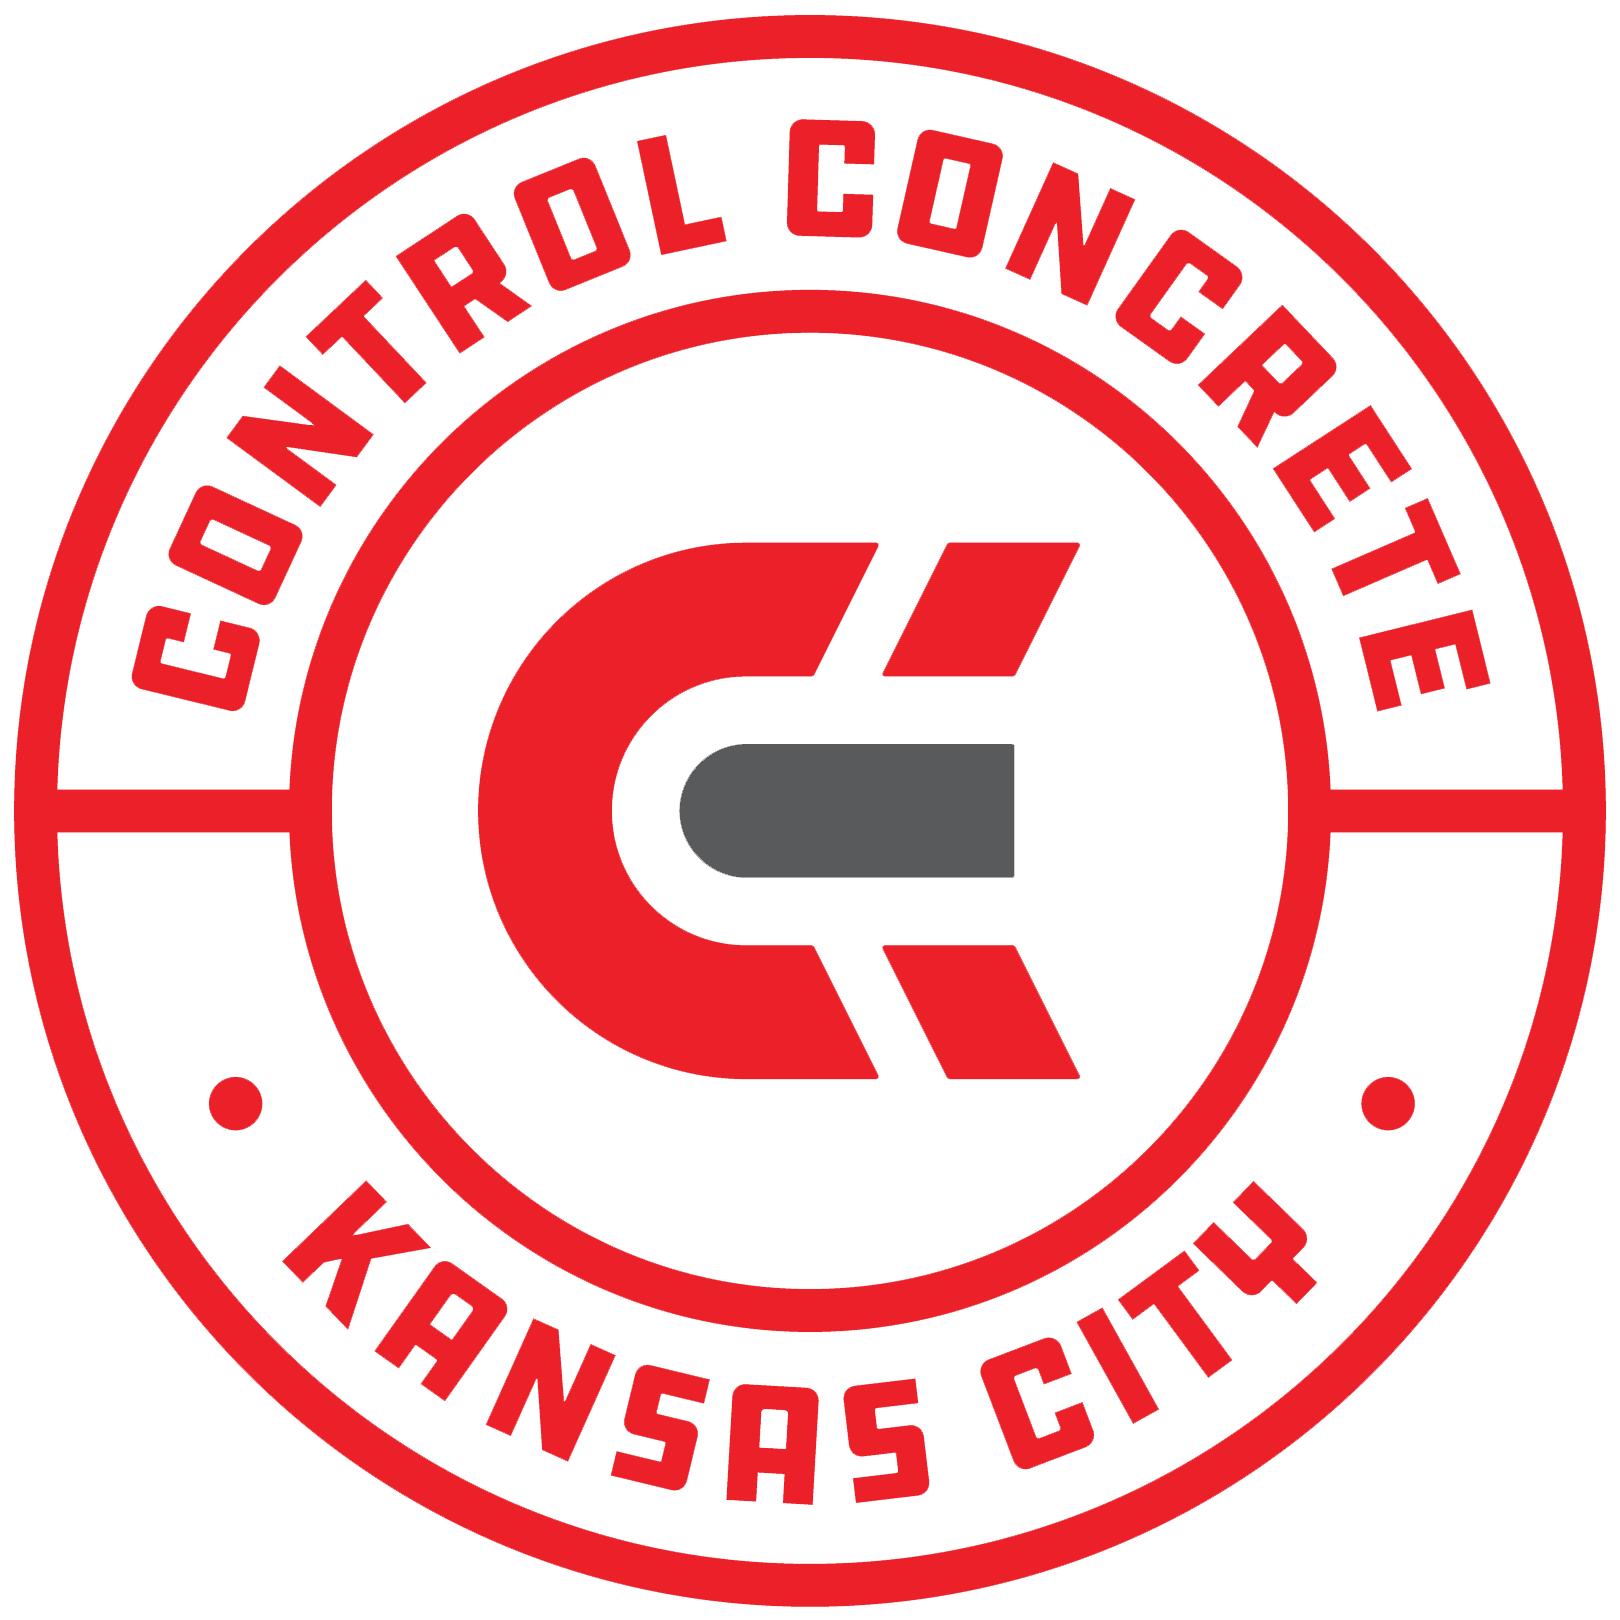 Control Concrete, LLC